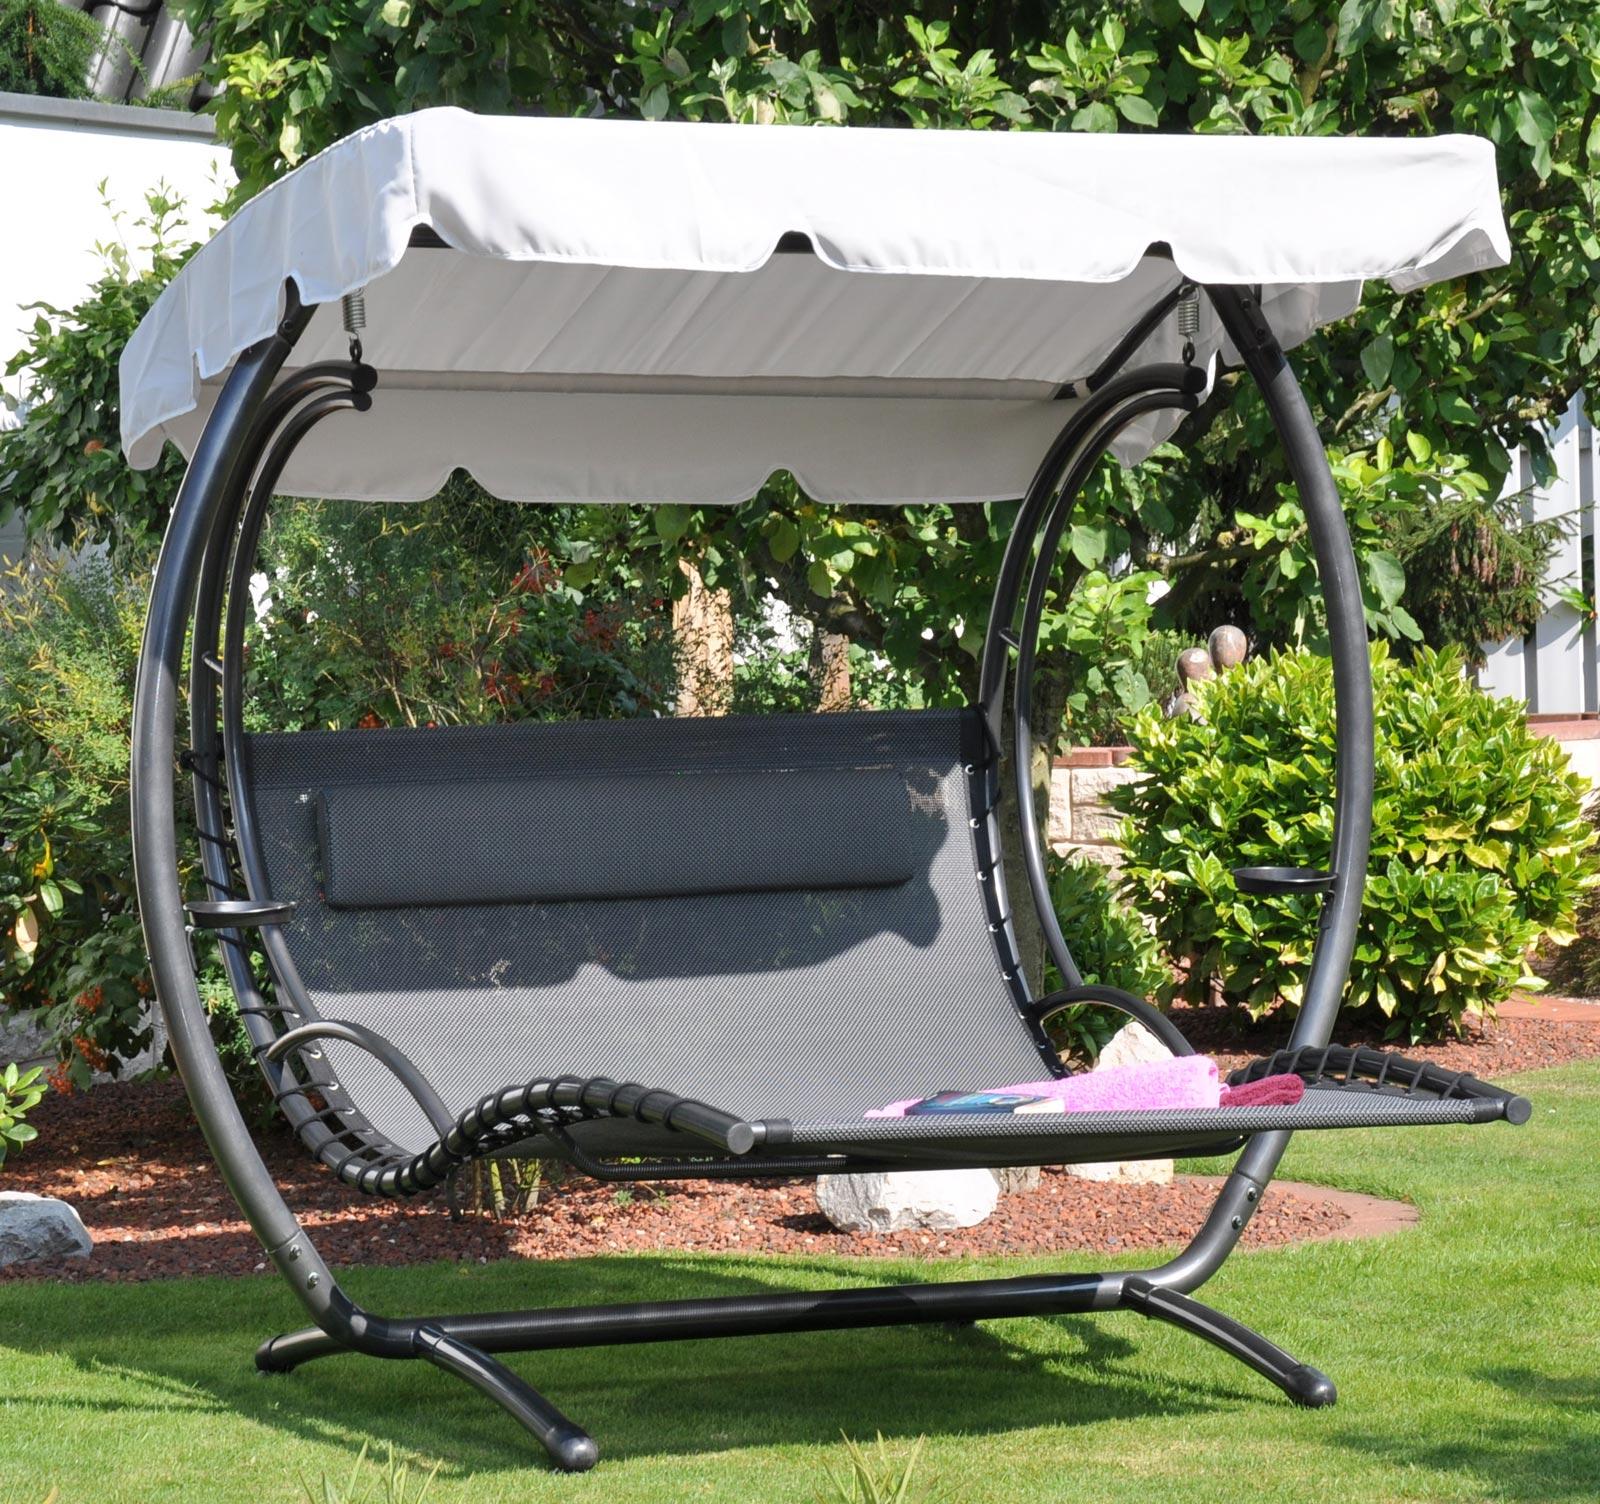 doppel gartenliege duo swing xxl stahl schwarz mit. Black Bedroom Furniture Sets. Home Design Ideas